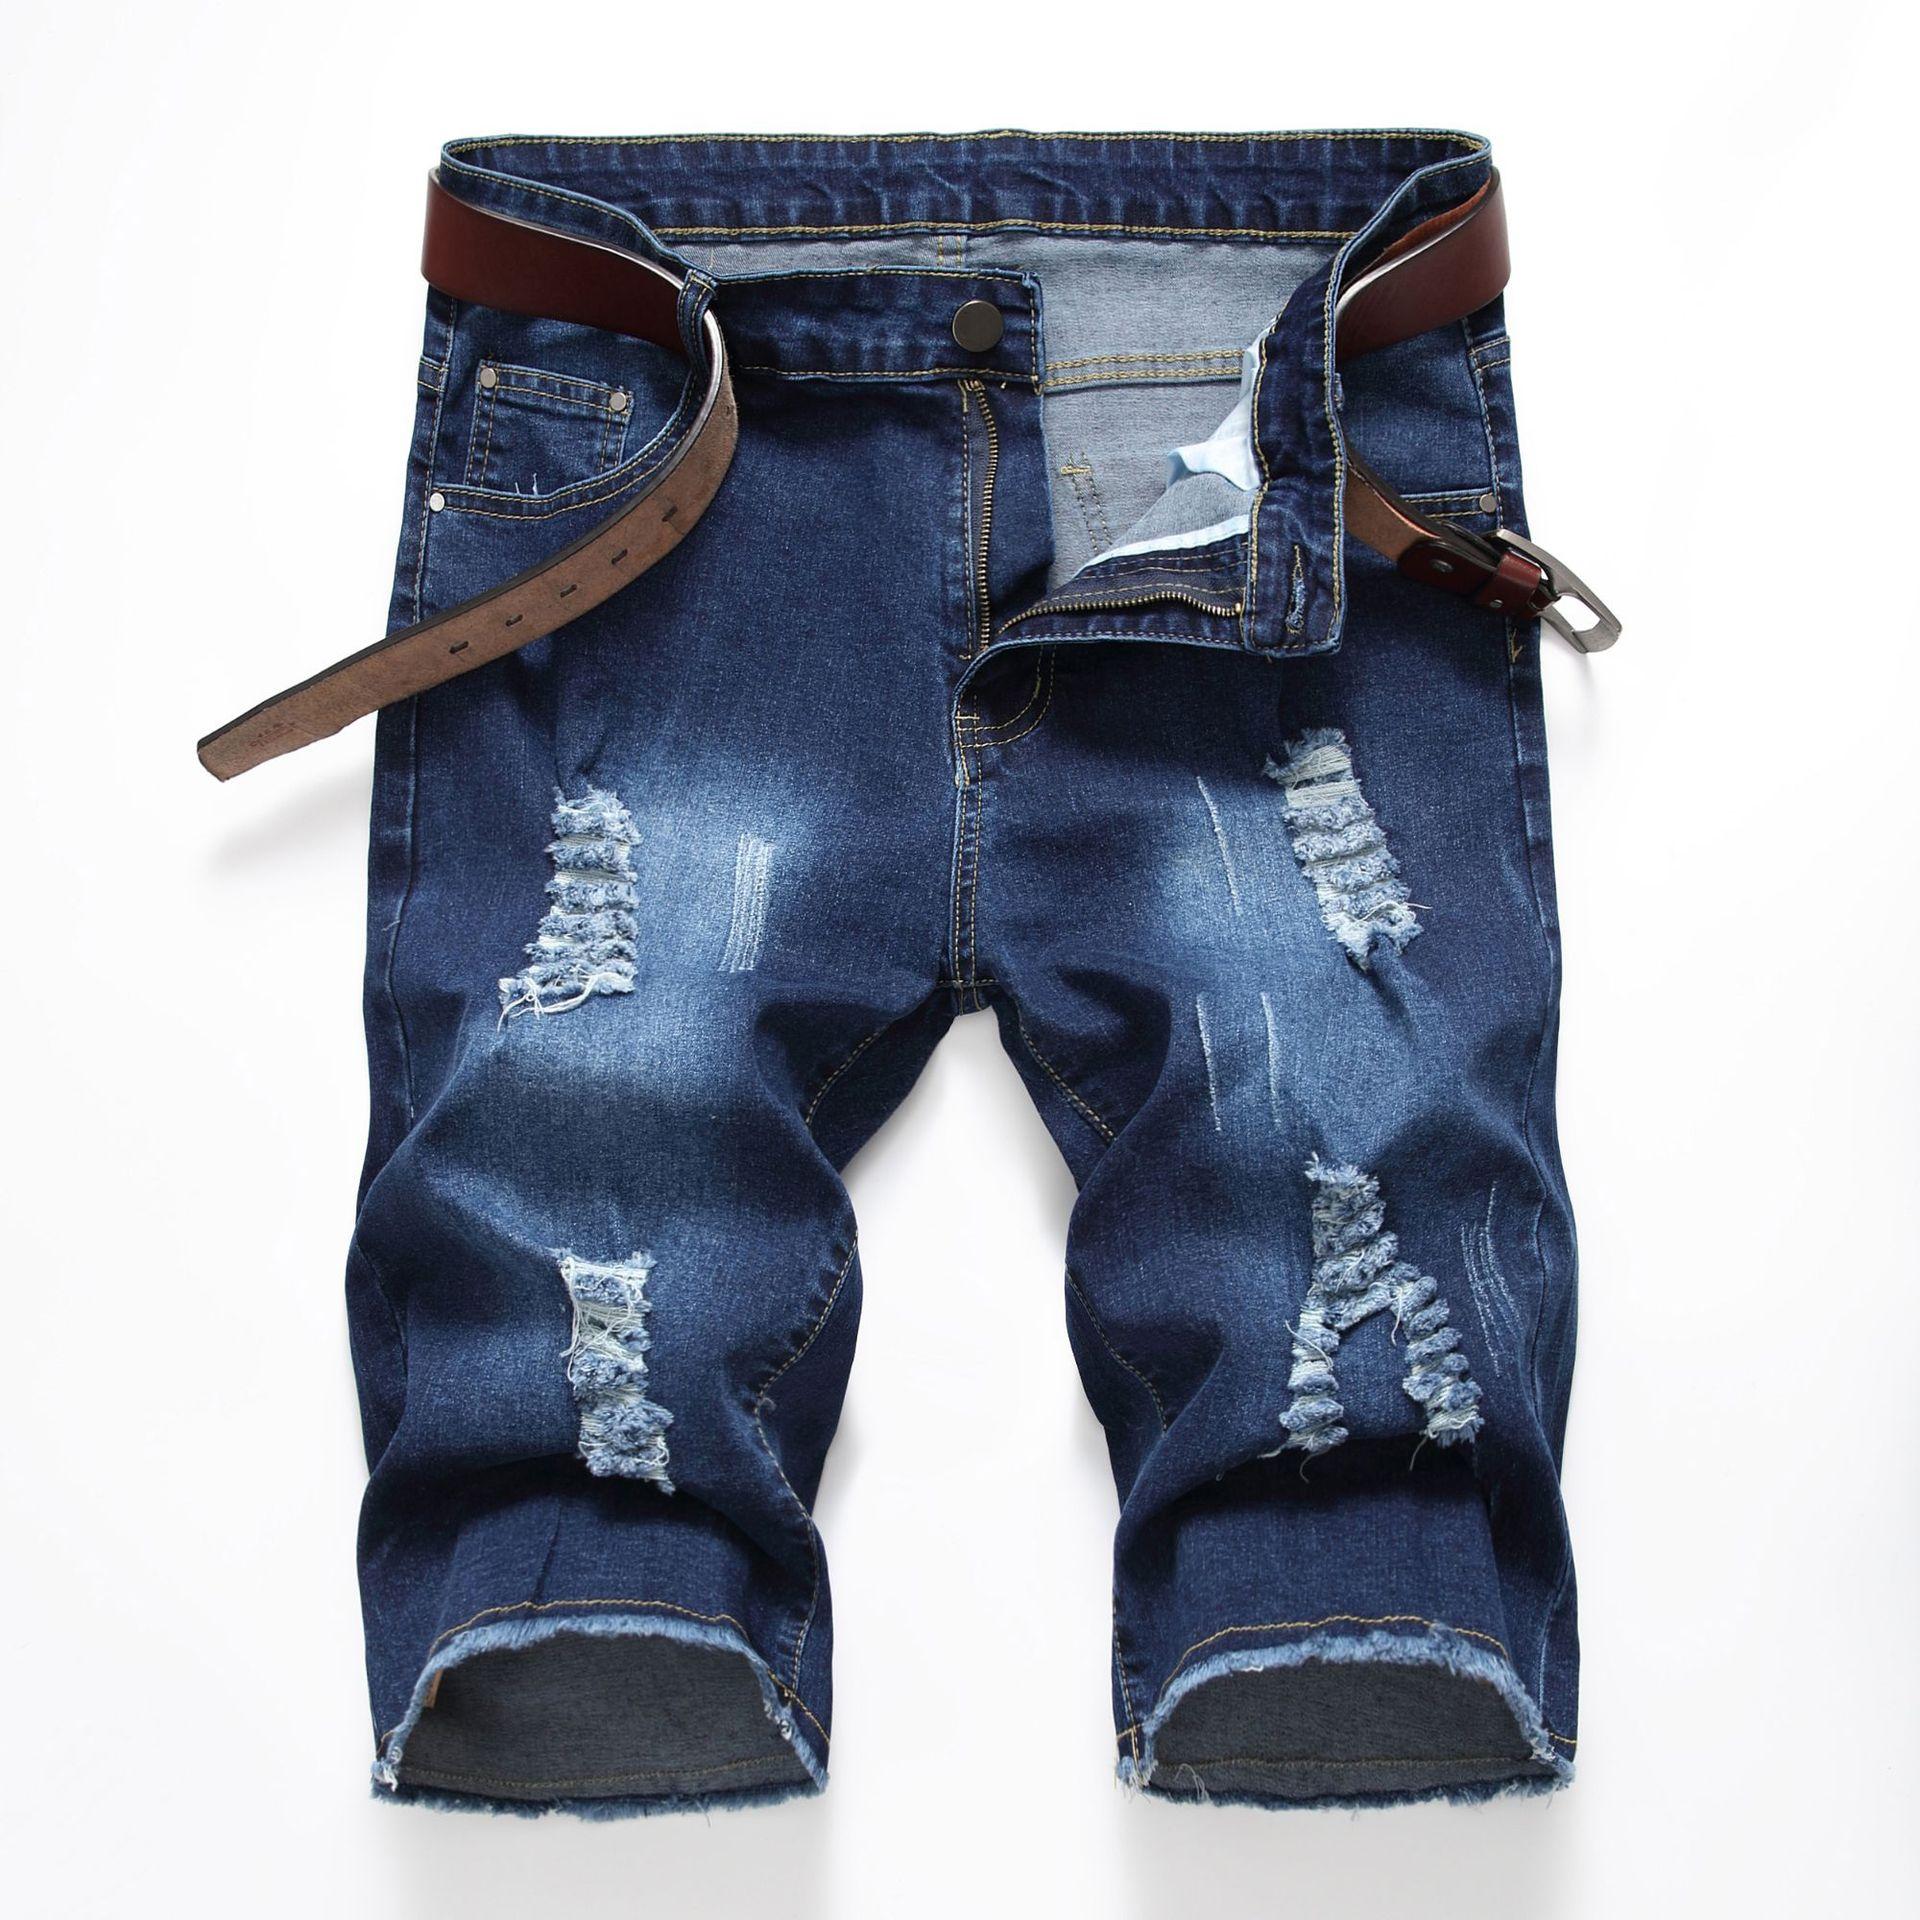 Hip Hop Ripped   jeans   for men Summer Man Pants   Jeans   Shorts Black 2019 Fashion Design